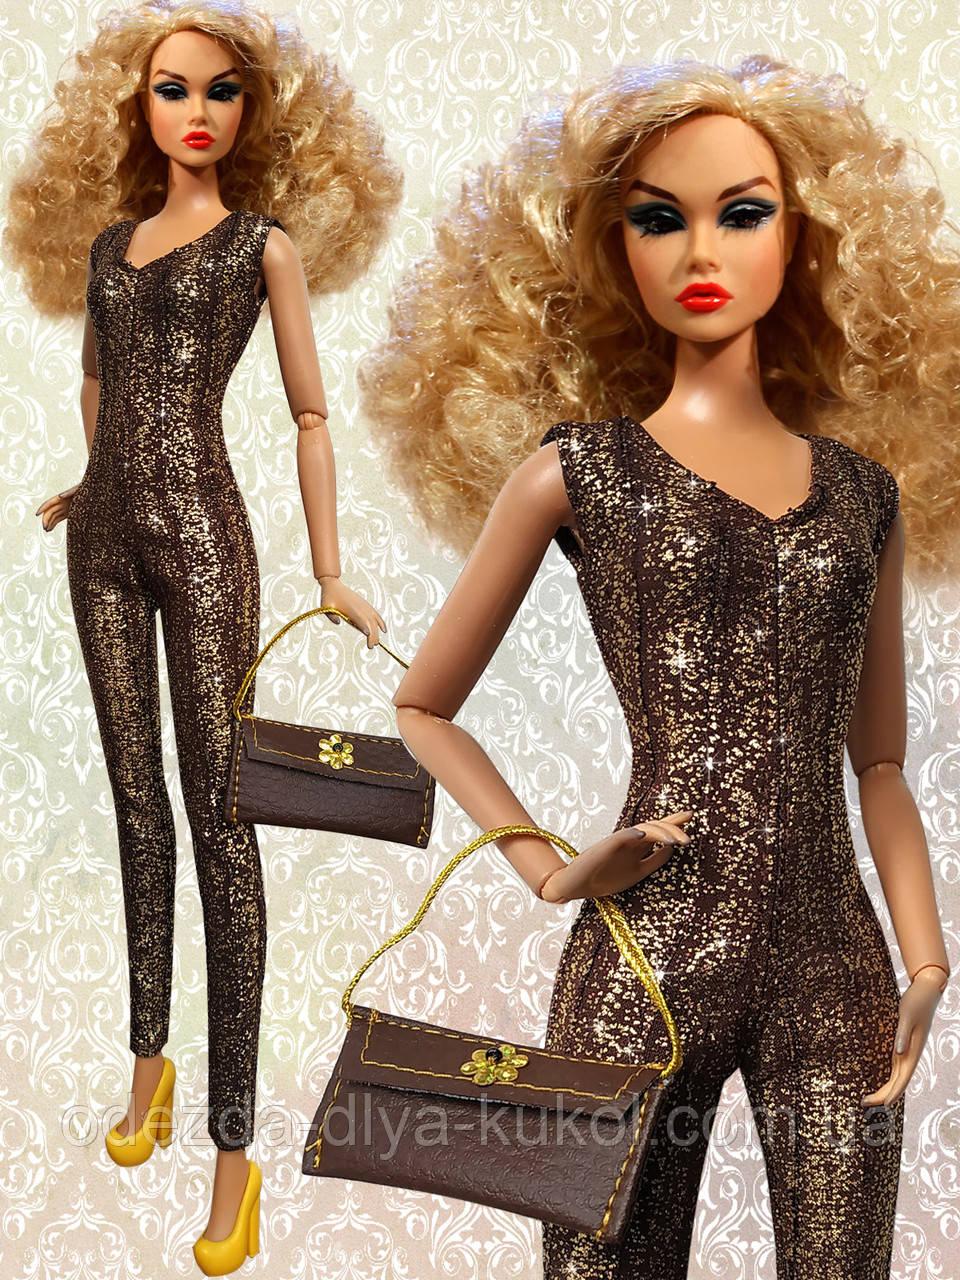 Одежда для кукол Барби - комбинезон и сумочка